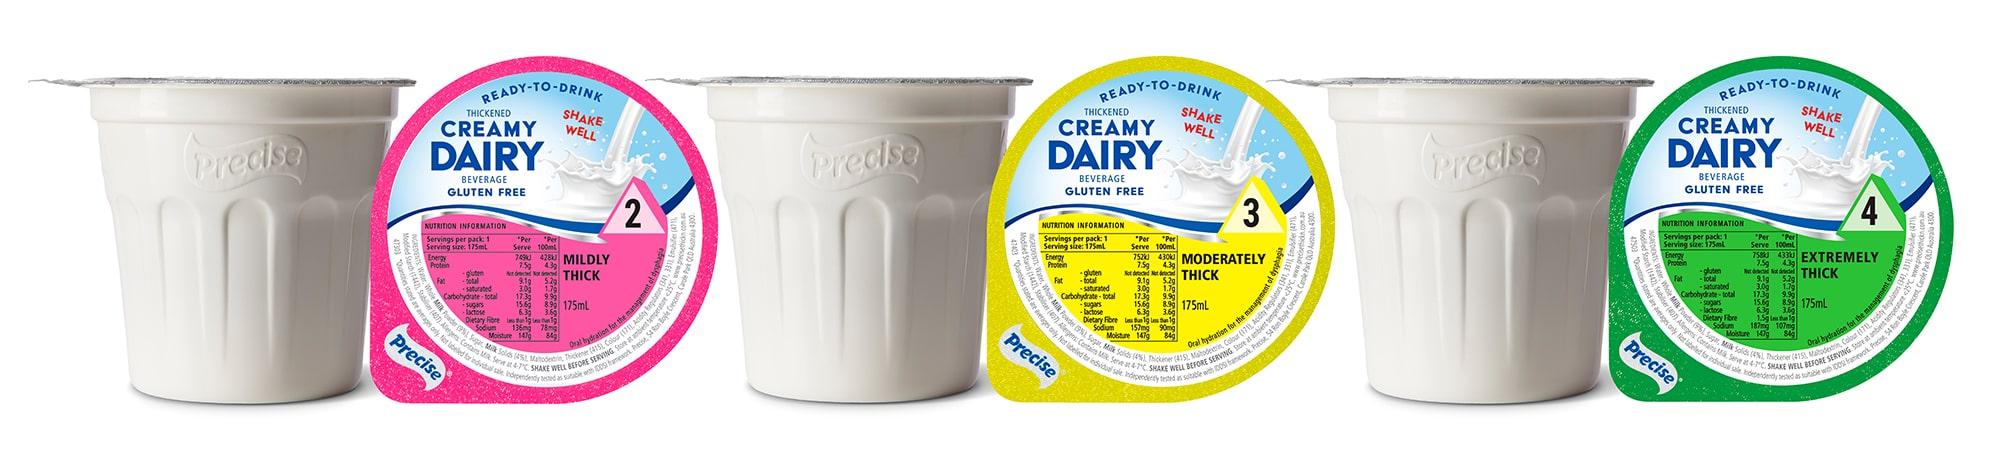 RTD Creamy Dairy